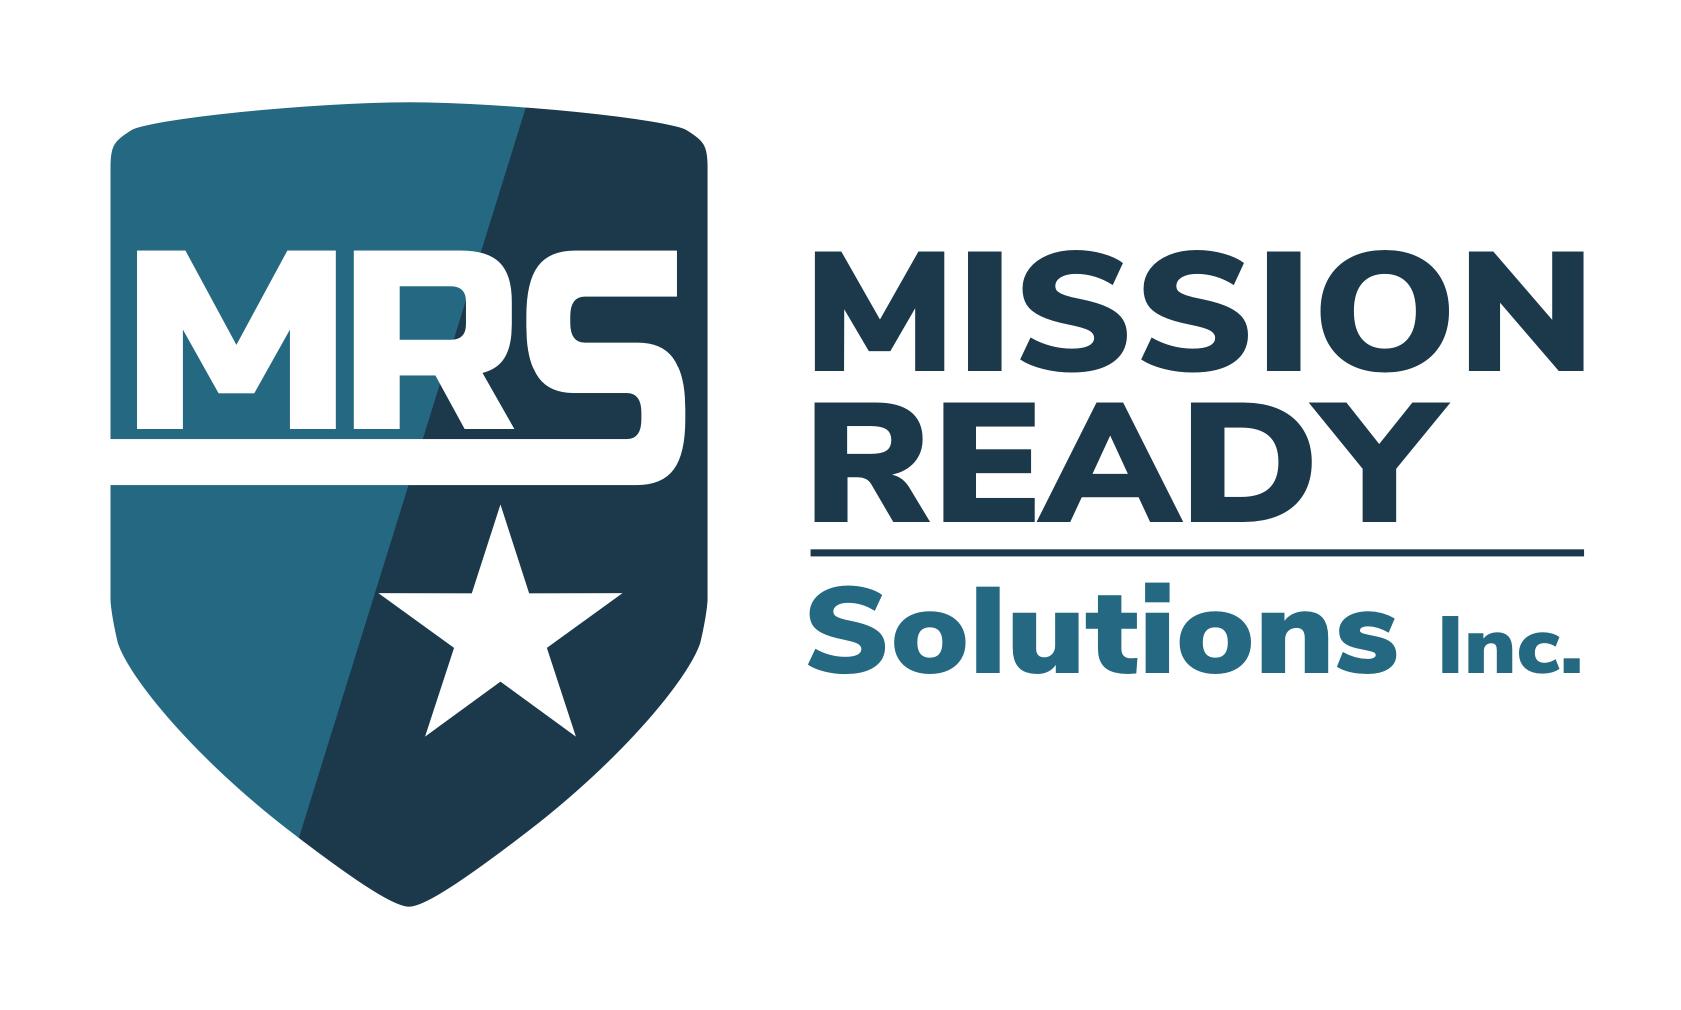 Mission Ready Announces CAD $24 Million FEMA Contract Award